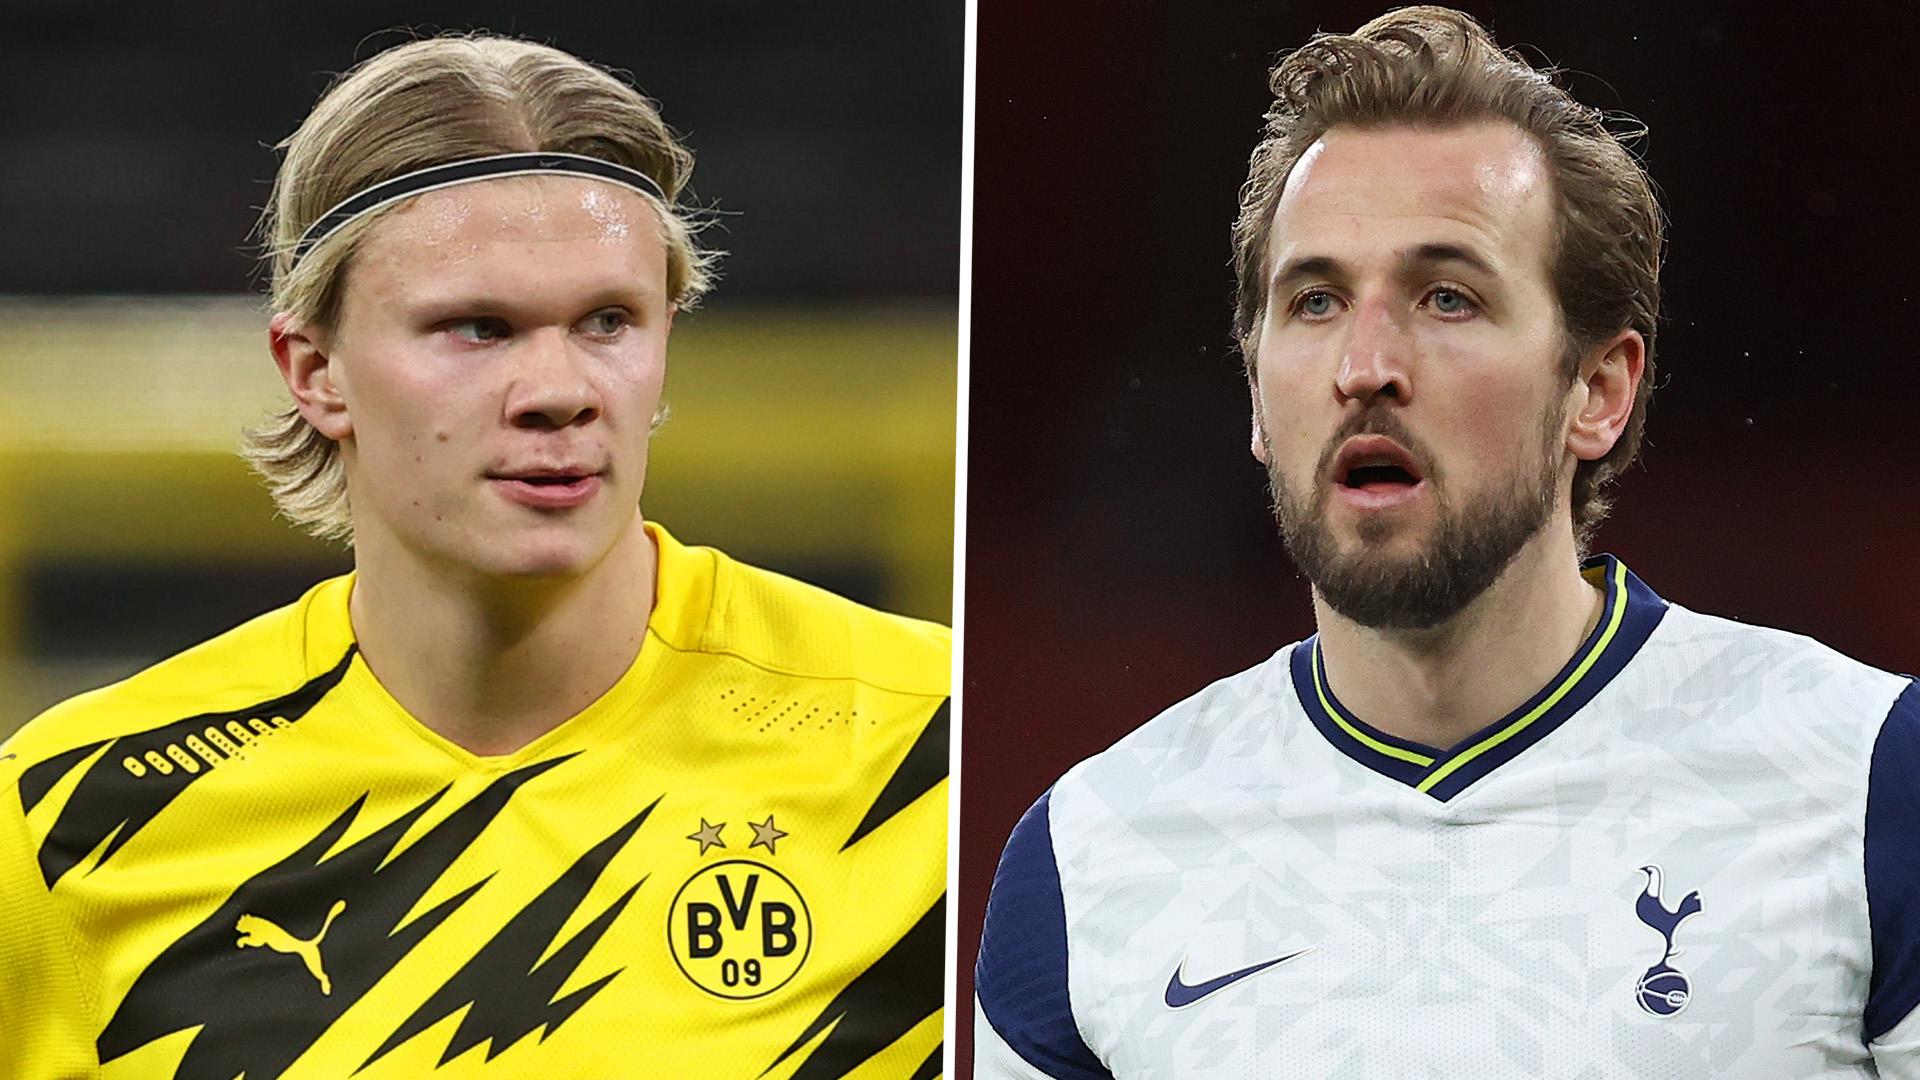 Man City 'getting another top striker' amid Kane & Haaland talk as Nmecha explains his exit